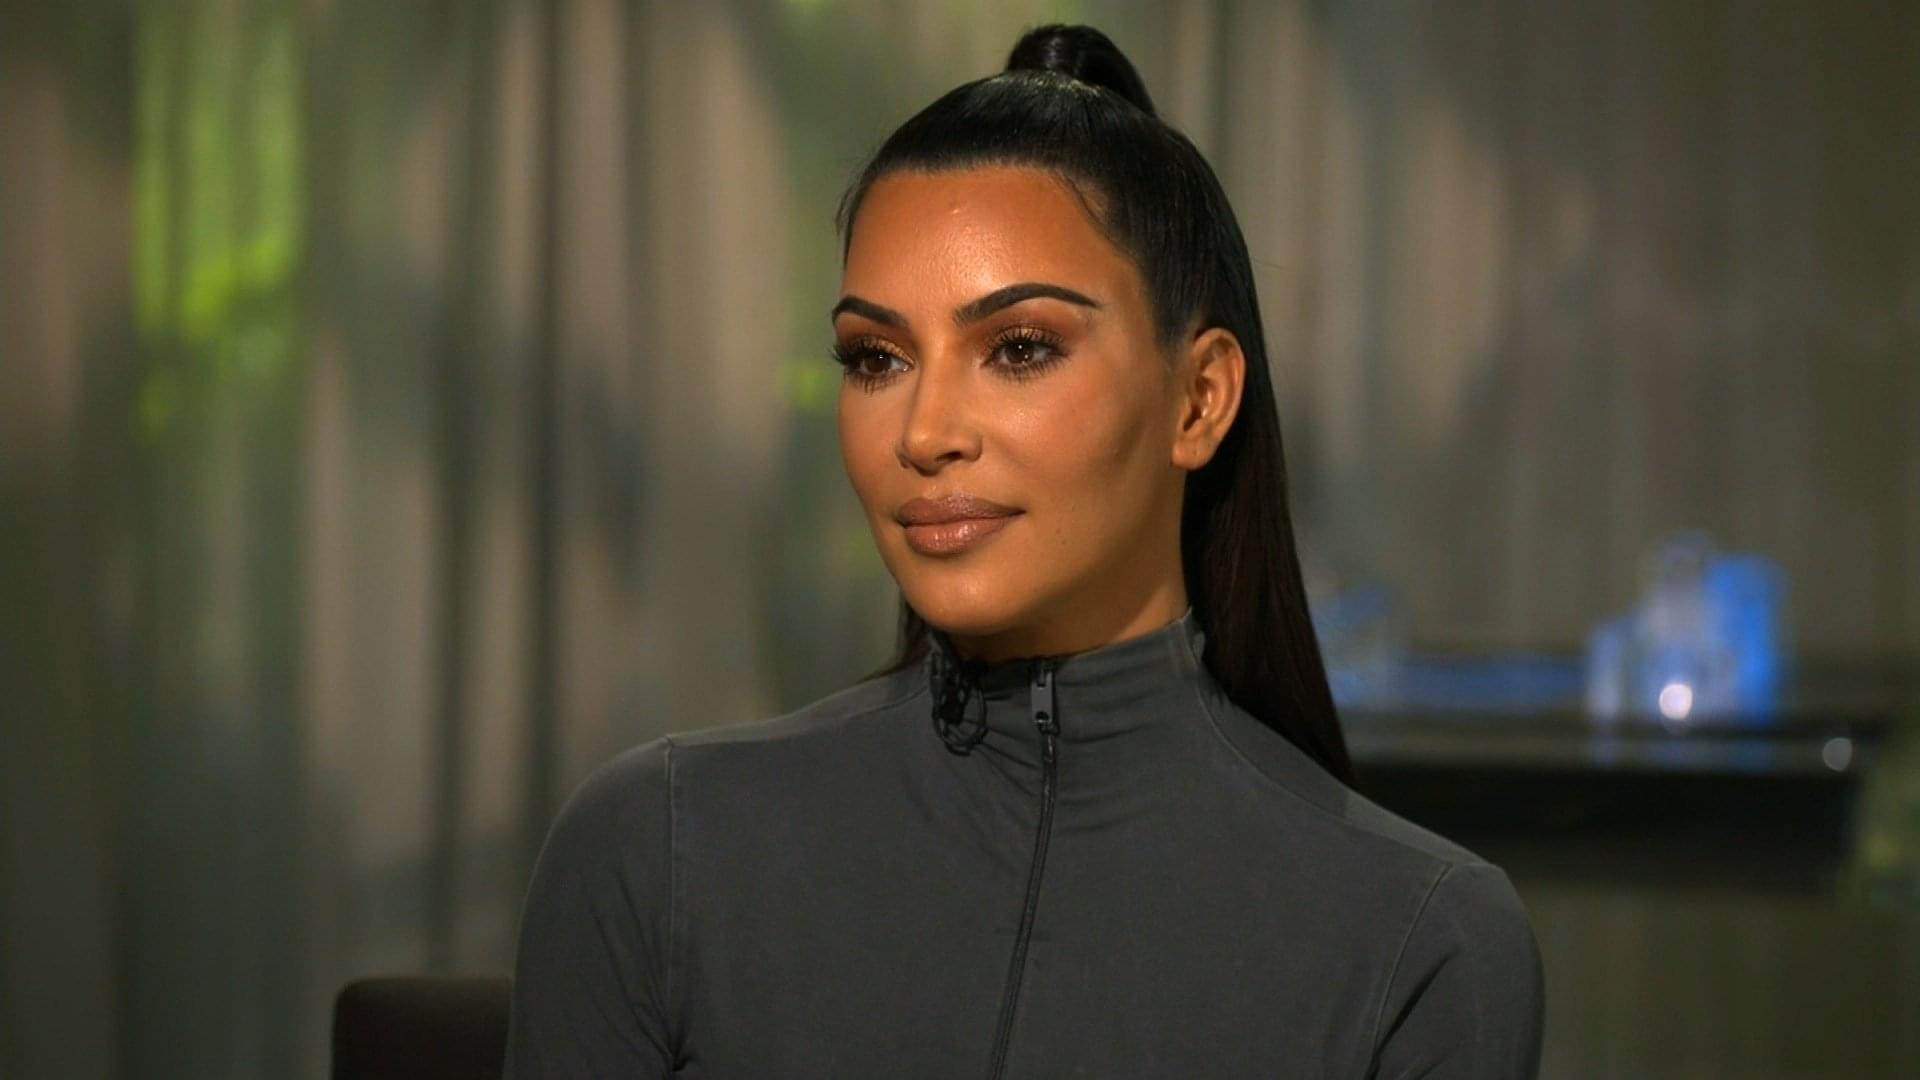 Kim Kardashian New Fashion Implants